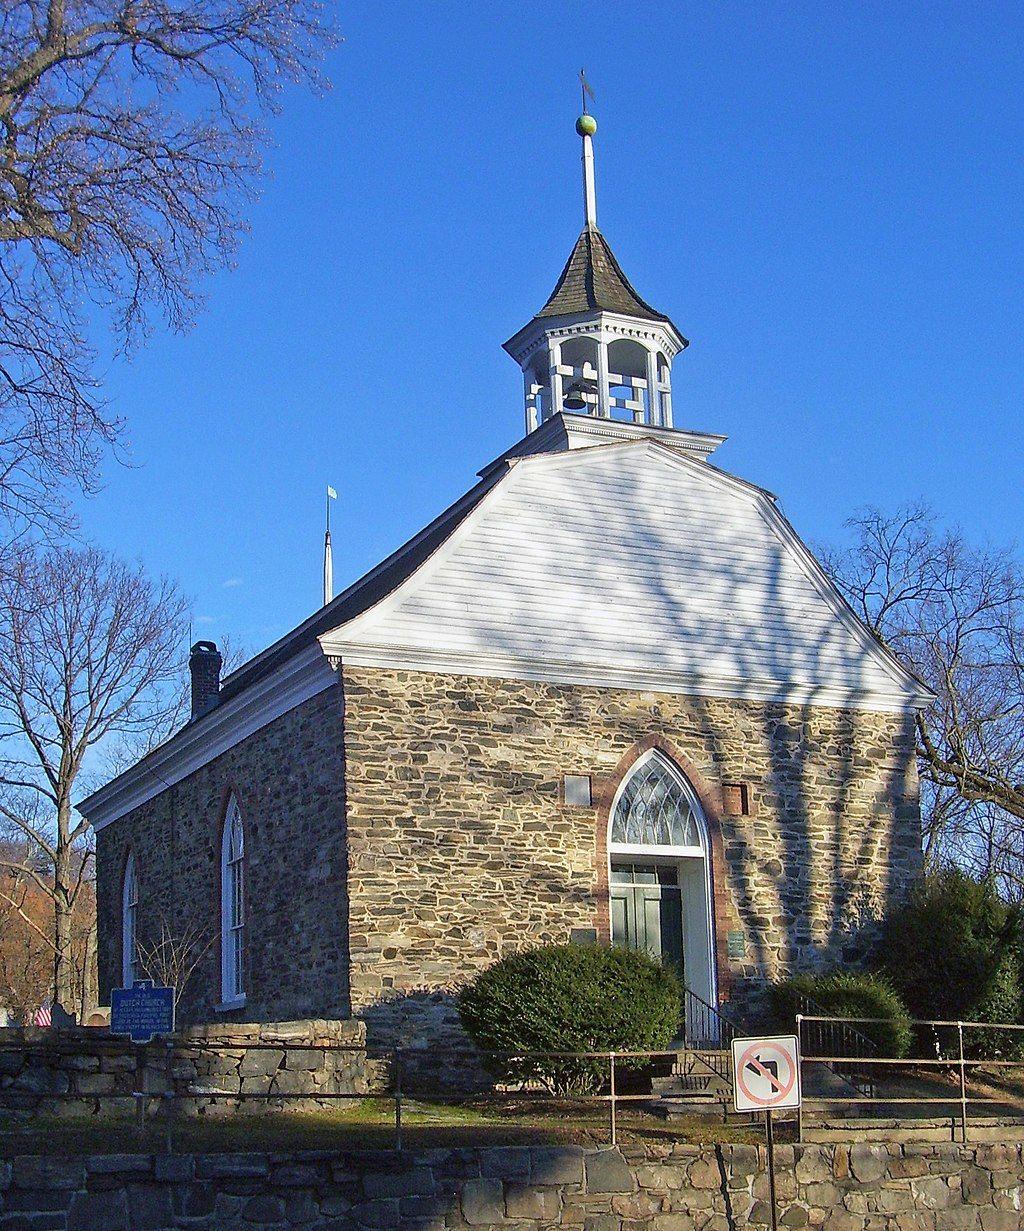 Old Dutch Church in Sleepy Hollow